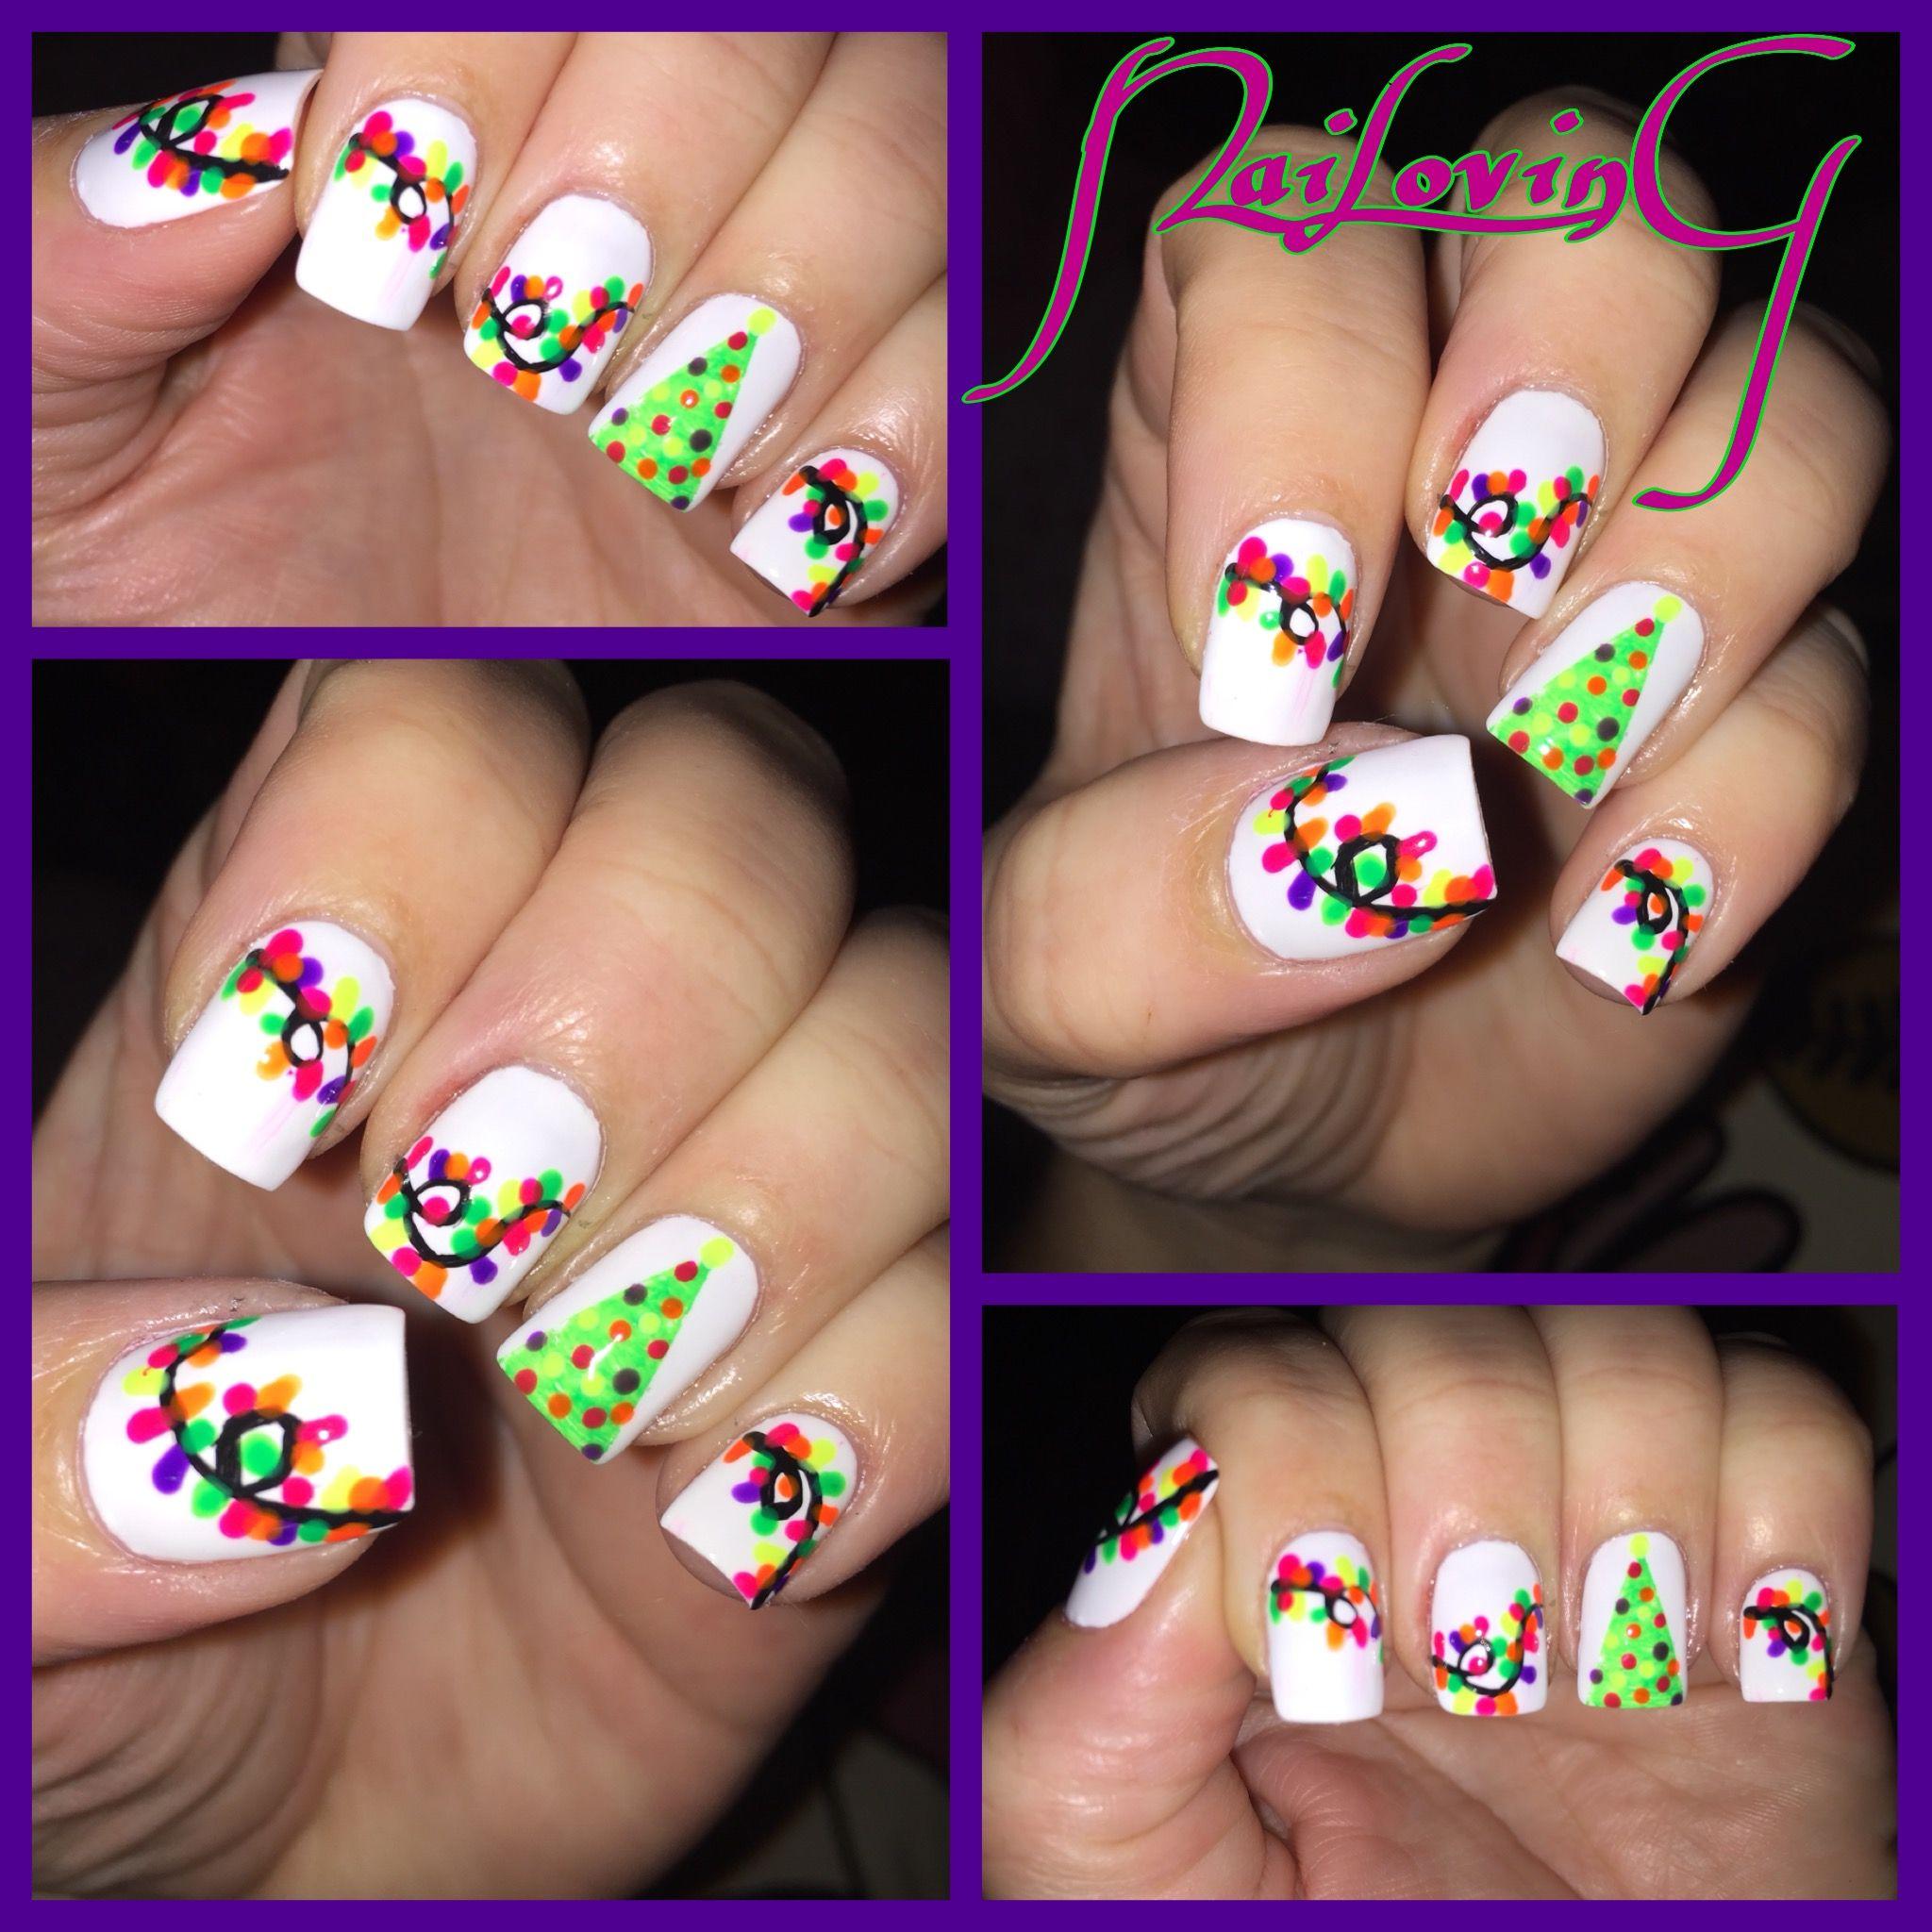 #neonchristmastree #inspired by @ohmygoshpolish #ChristmasNails #christmastreenails #featuremynails #fashionaddictxo #ignails #notd #notn #nails #nailart #nailoving #nailaddict #nailartaddict #nails2inspire #nails4yummies #nailsoftheweek #notd365nailart #nailsofinstagram #nailporn #christmaslightnails #neonnails #polishaddiction #sgnailartpromote #thenailartdiaries